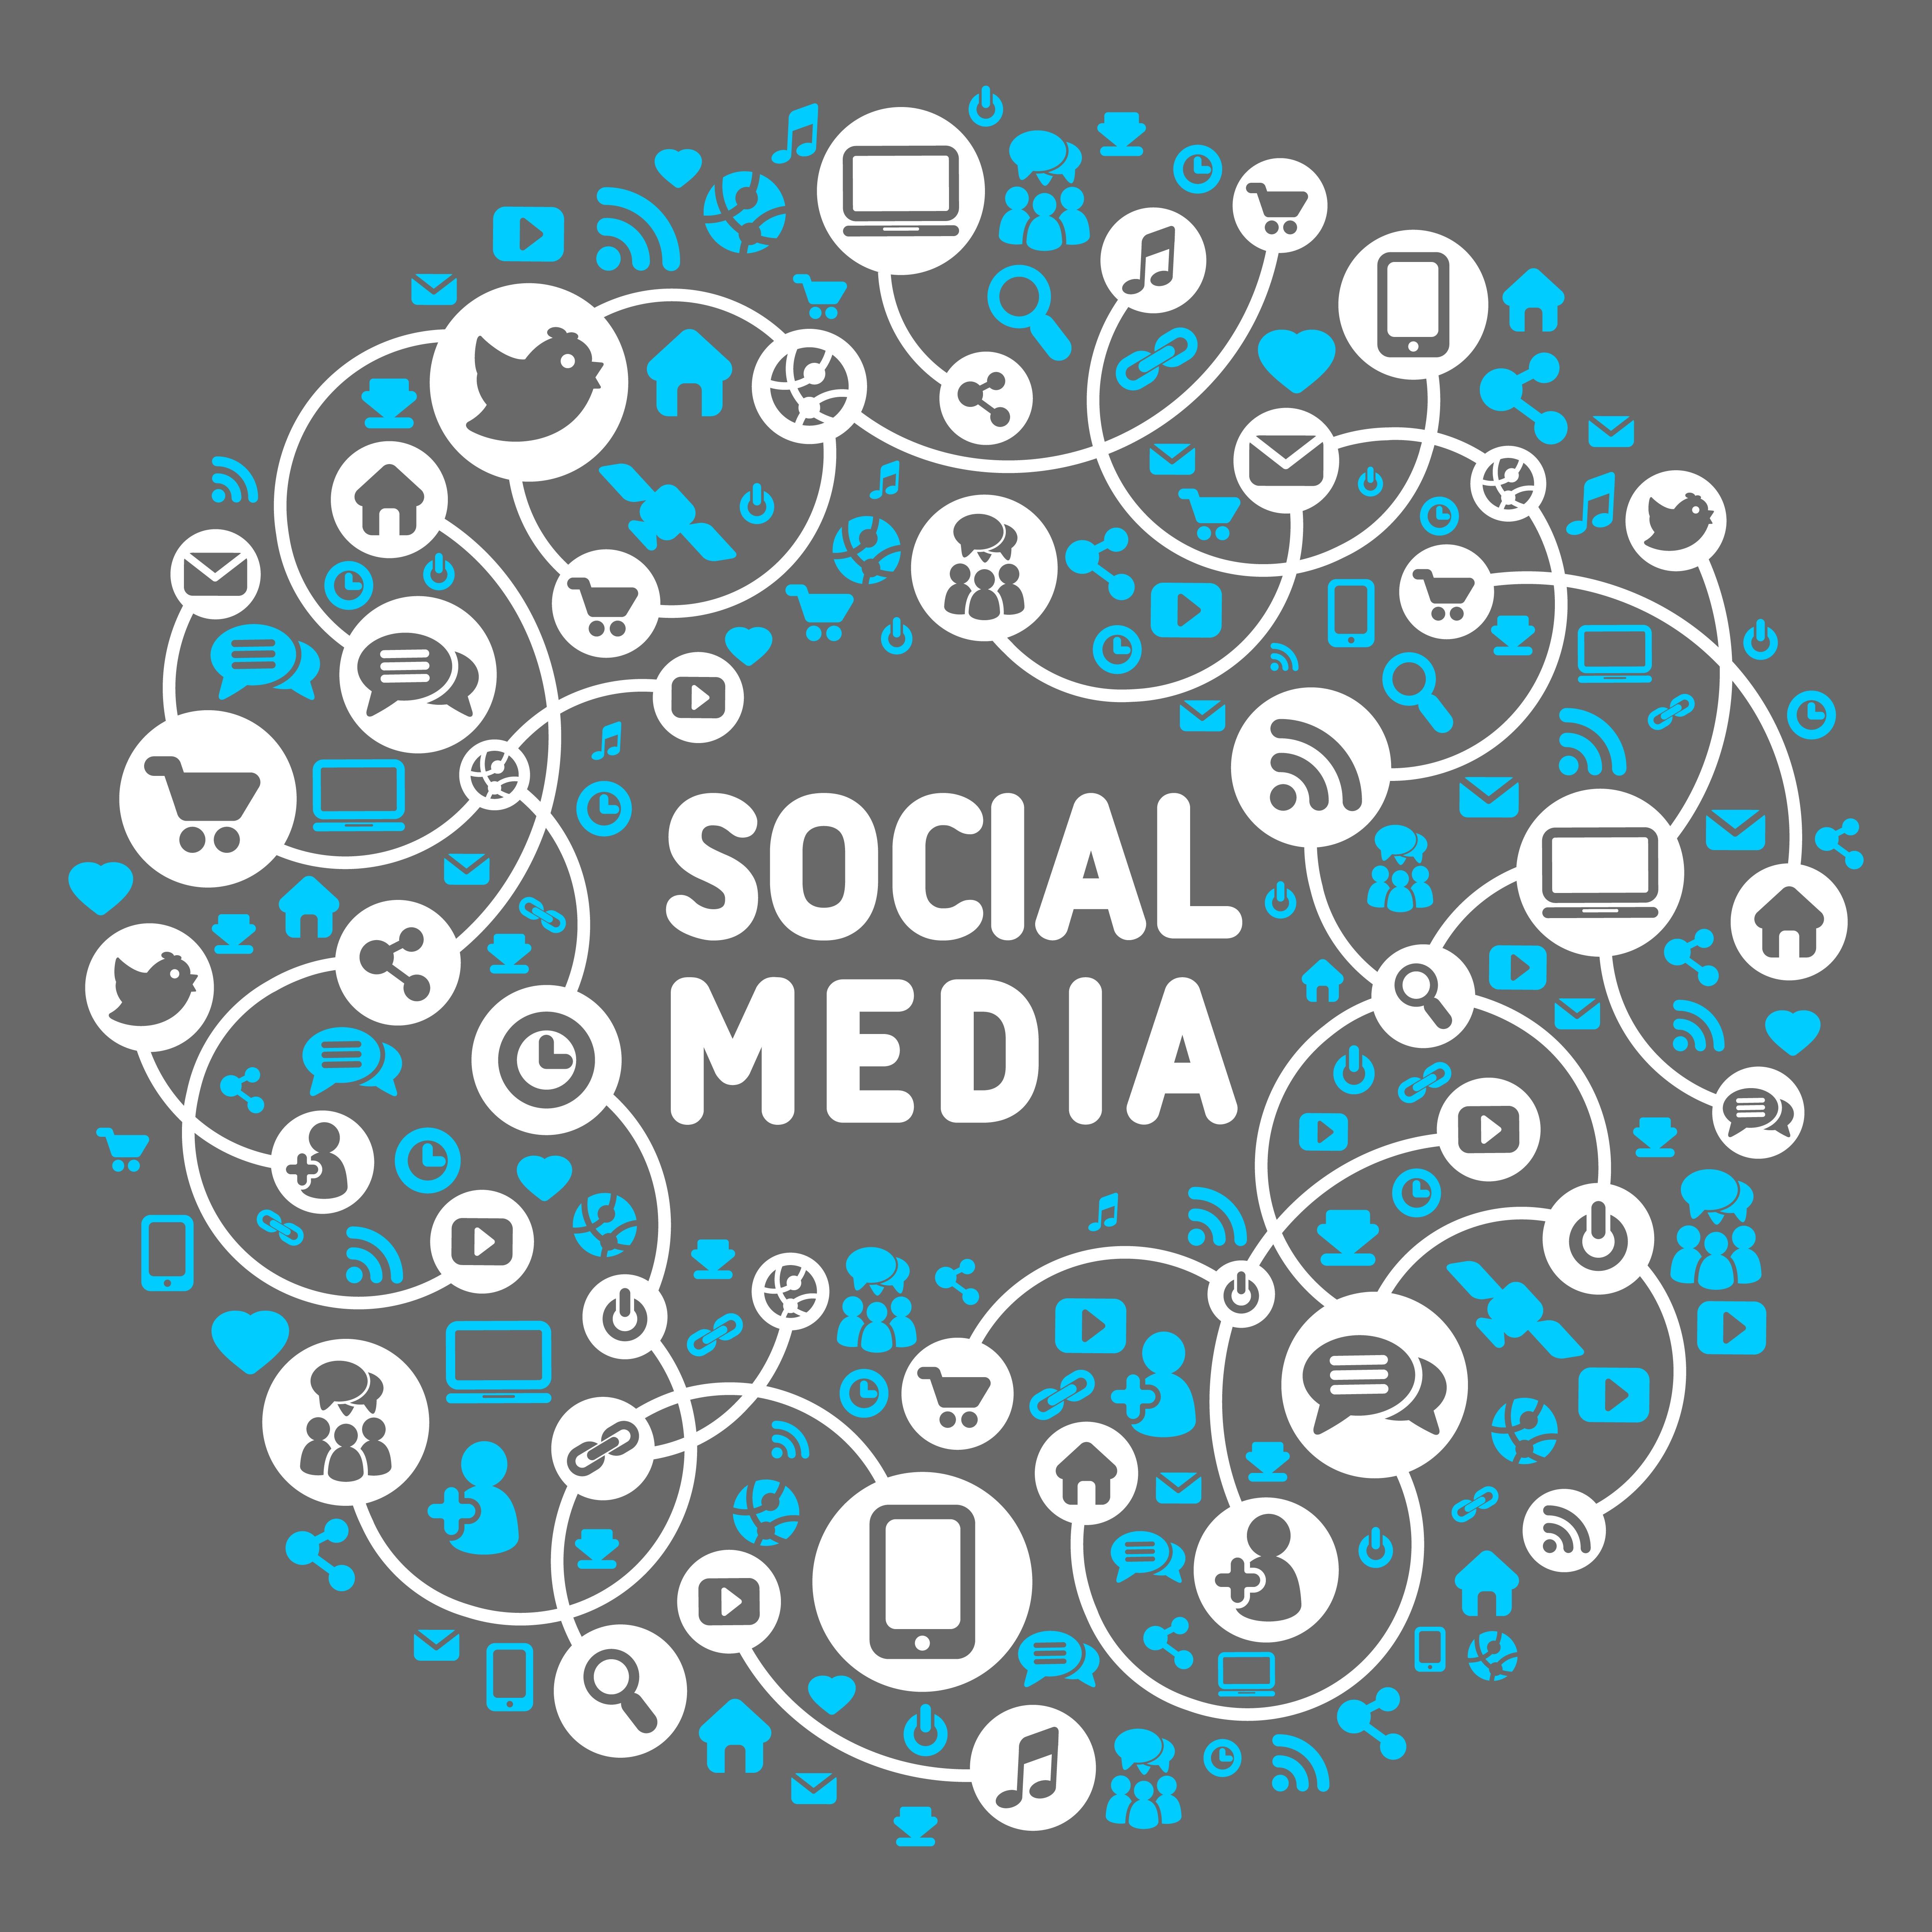 Social Media Marketing Trends For 2018